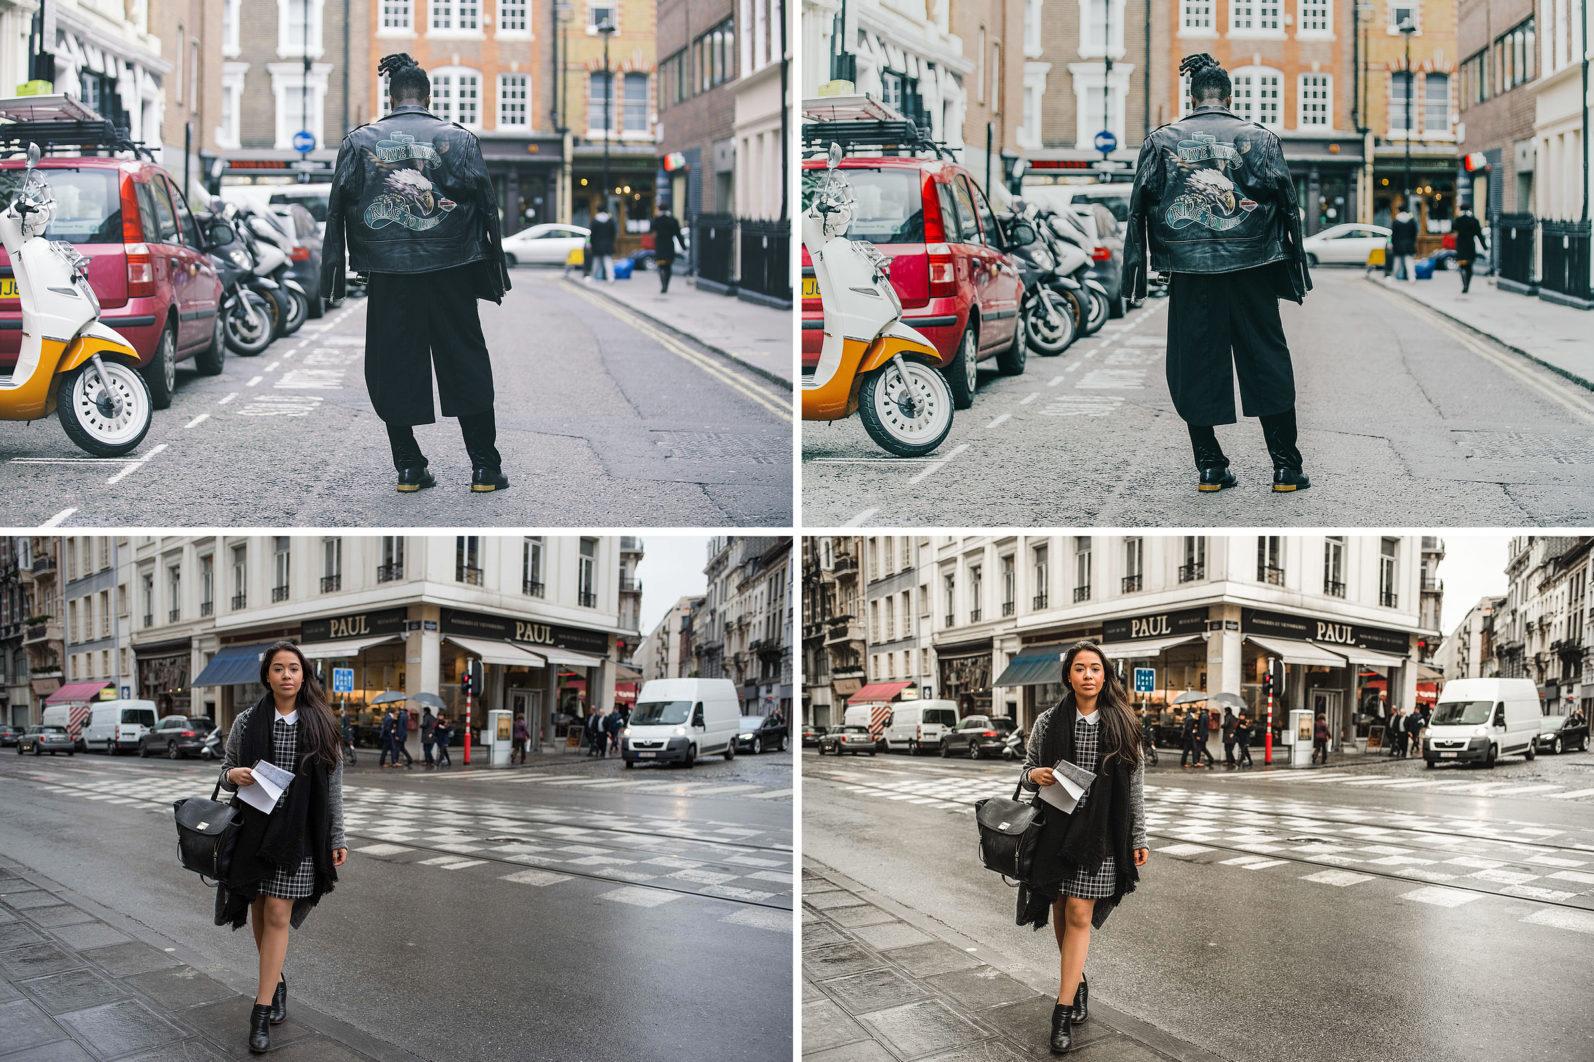 39. Street Fashion - 39.STREETFASHION 5 -